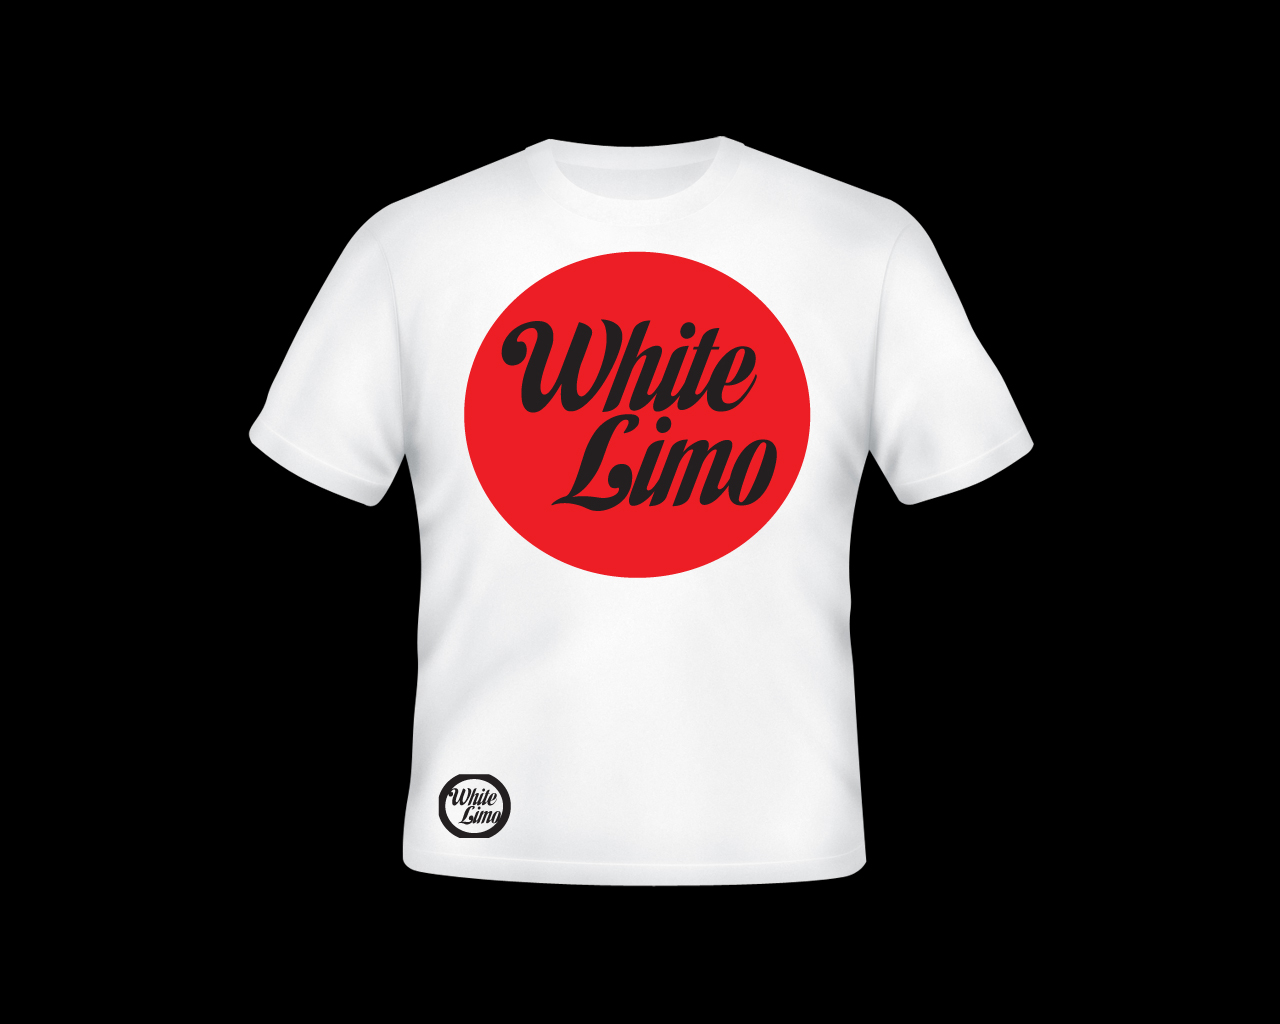 blank-white-pin-t-shirt logo intensered